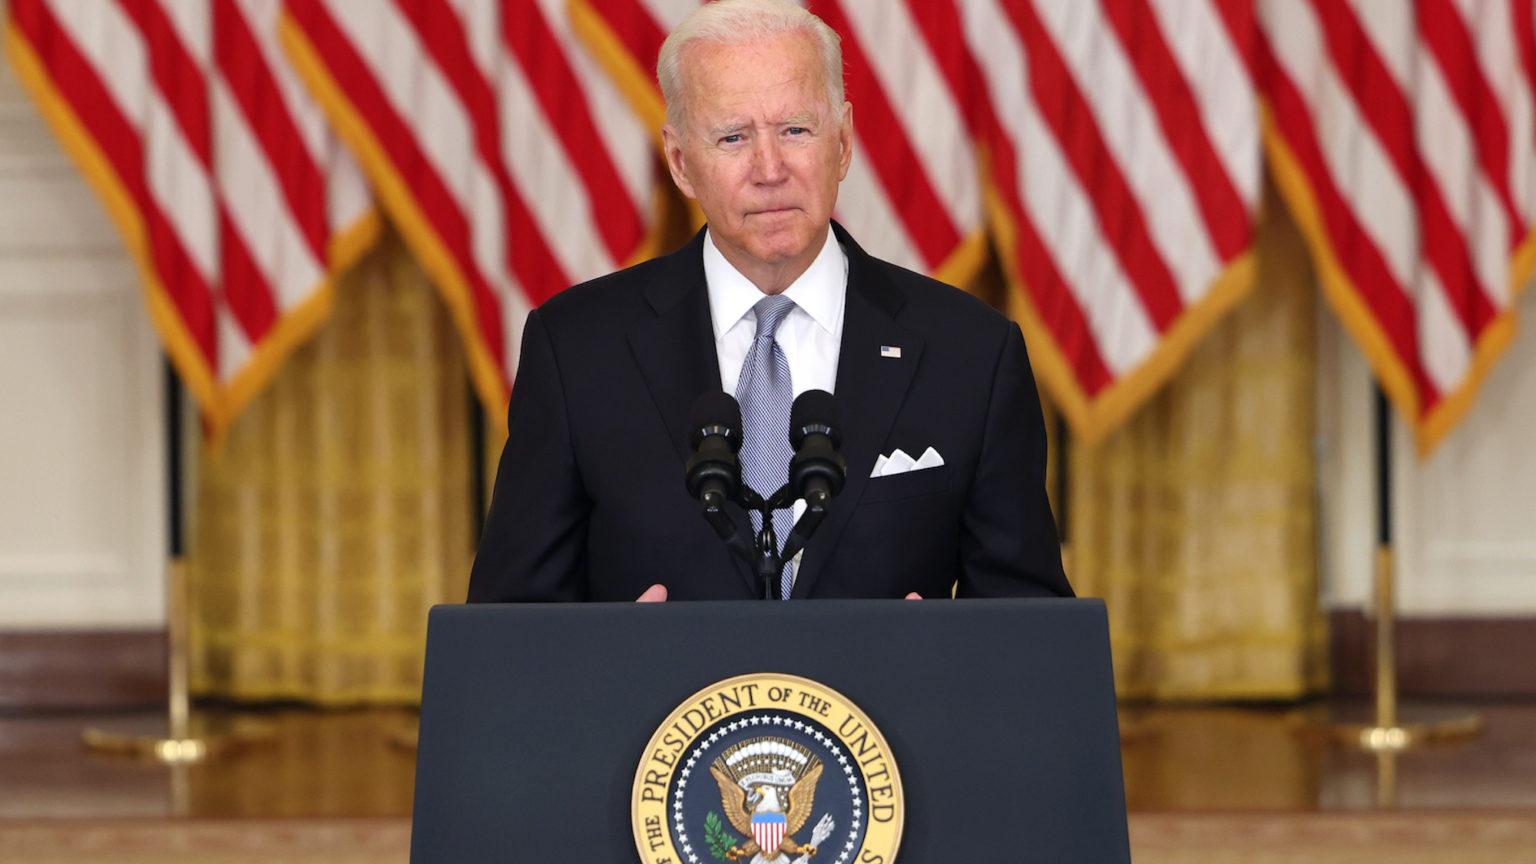 Joe Biden and the American malaise